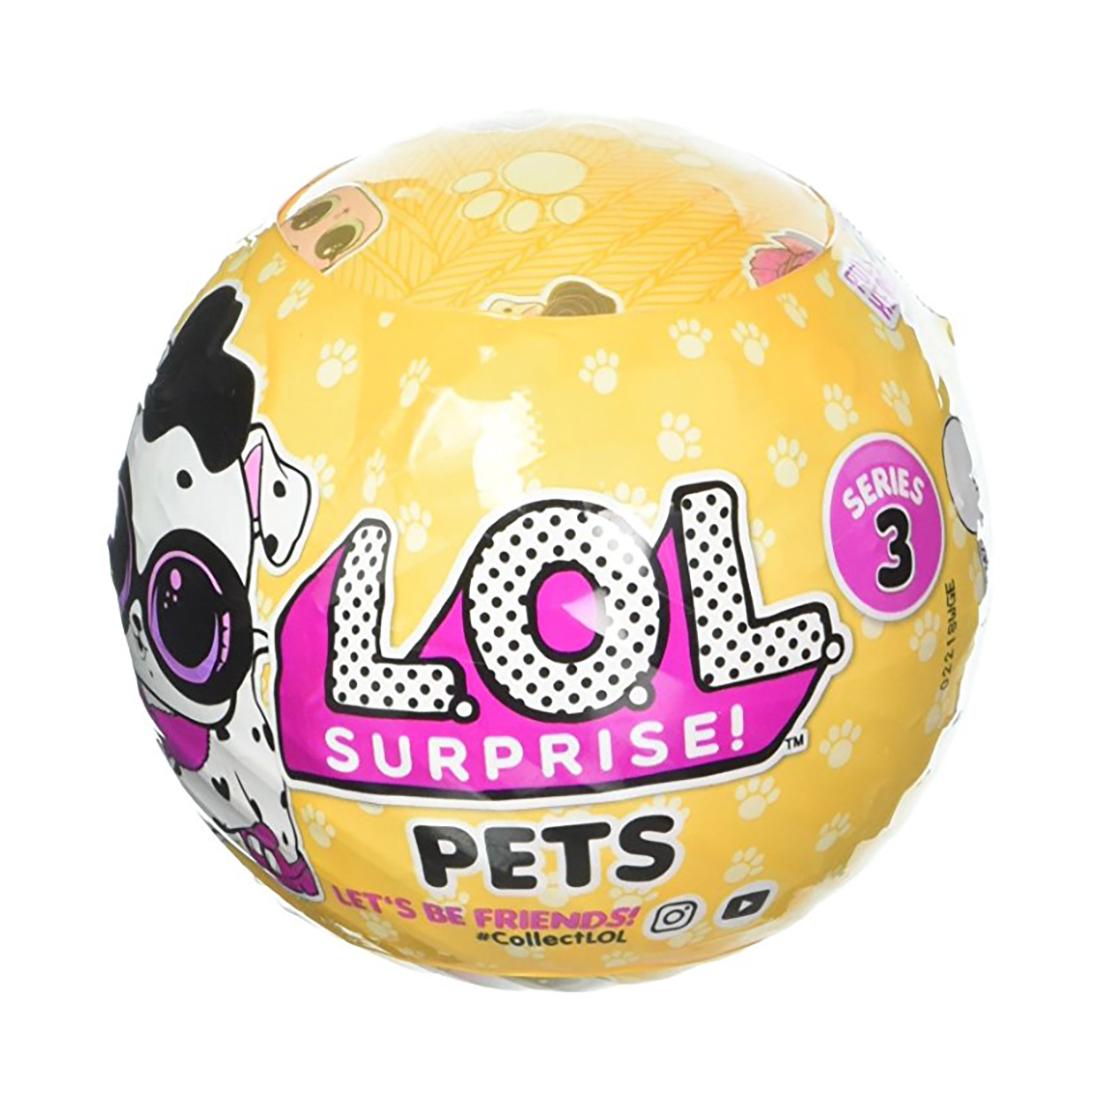 Papusa LOL Surprise Ball - Pets, 7 piese (Seria 3-2B)